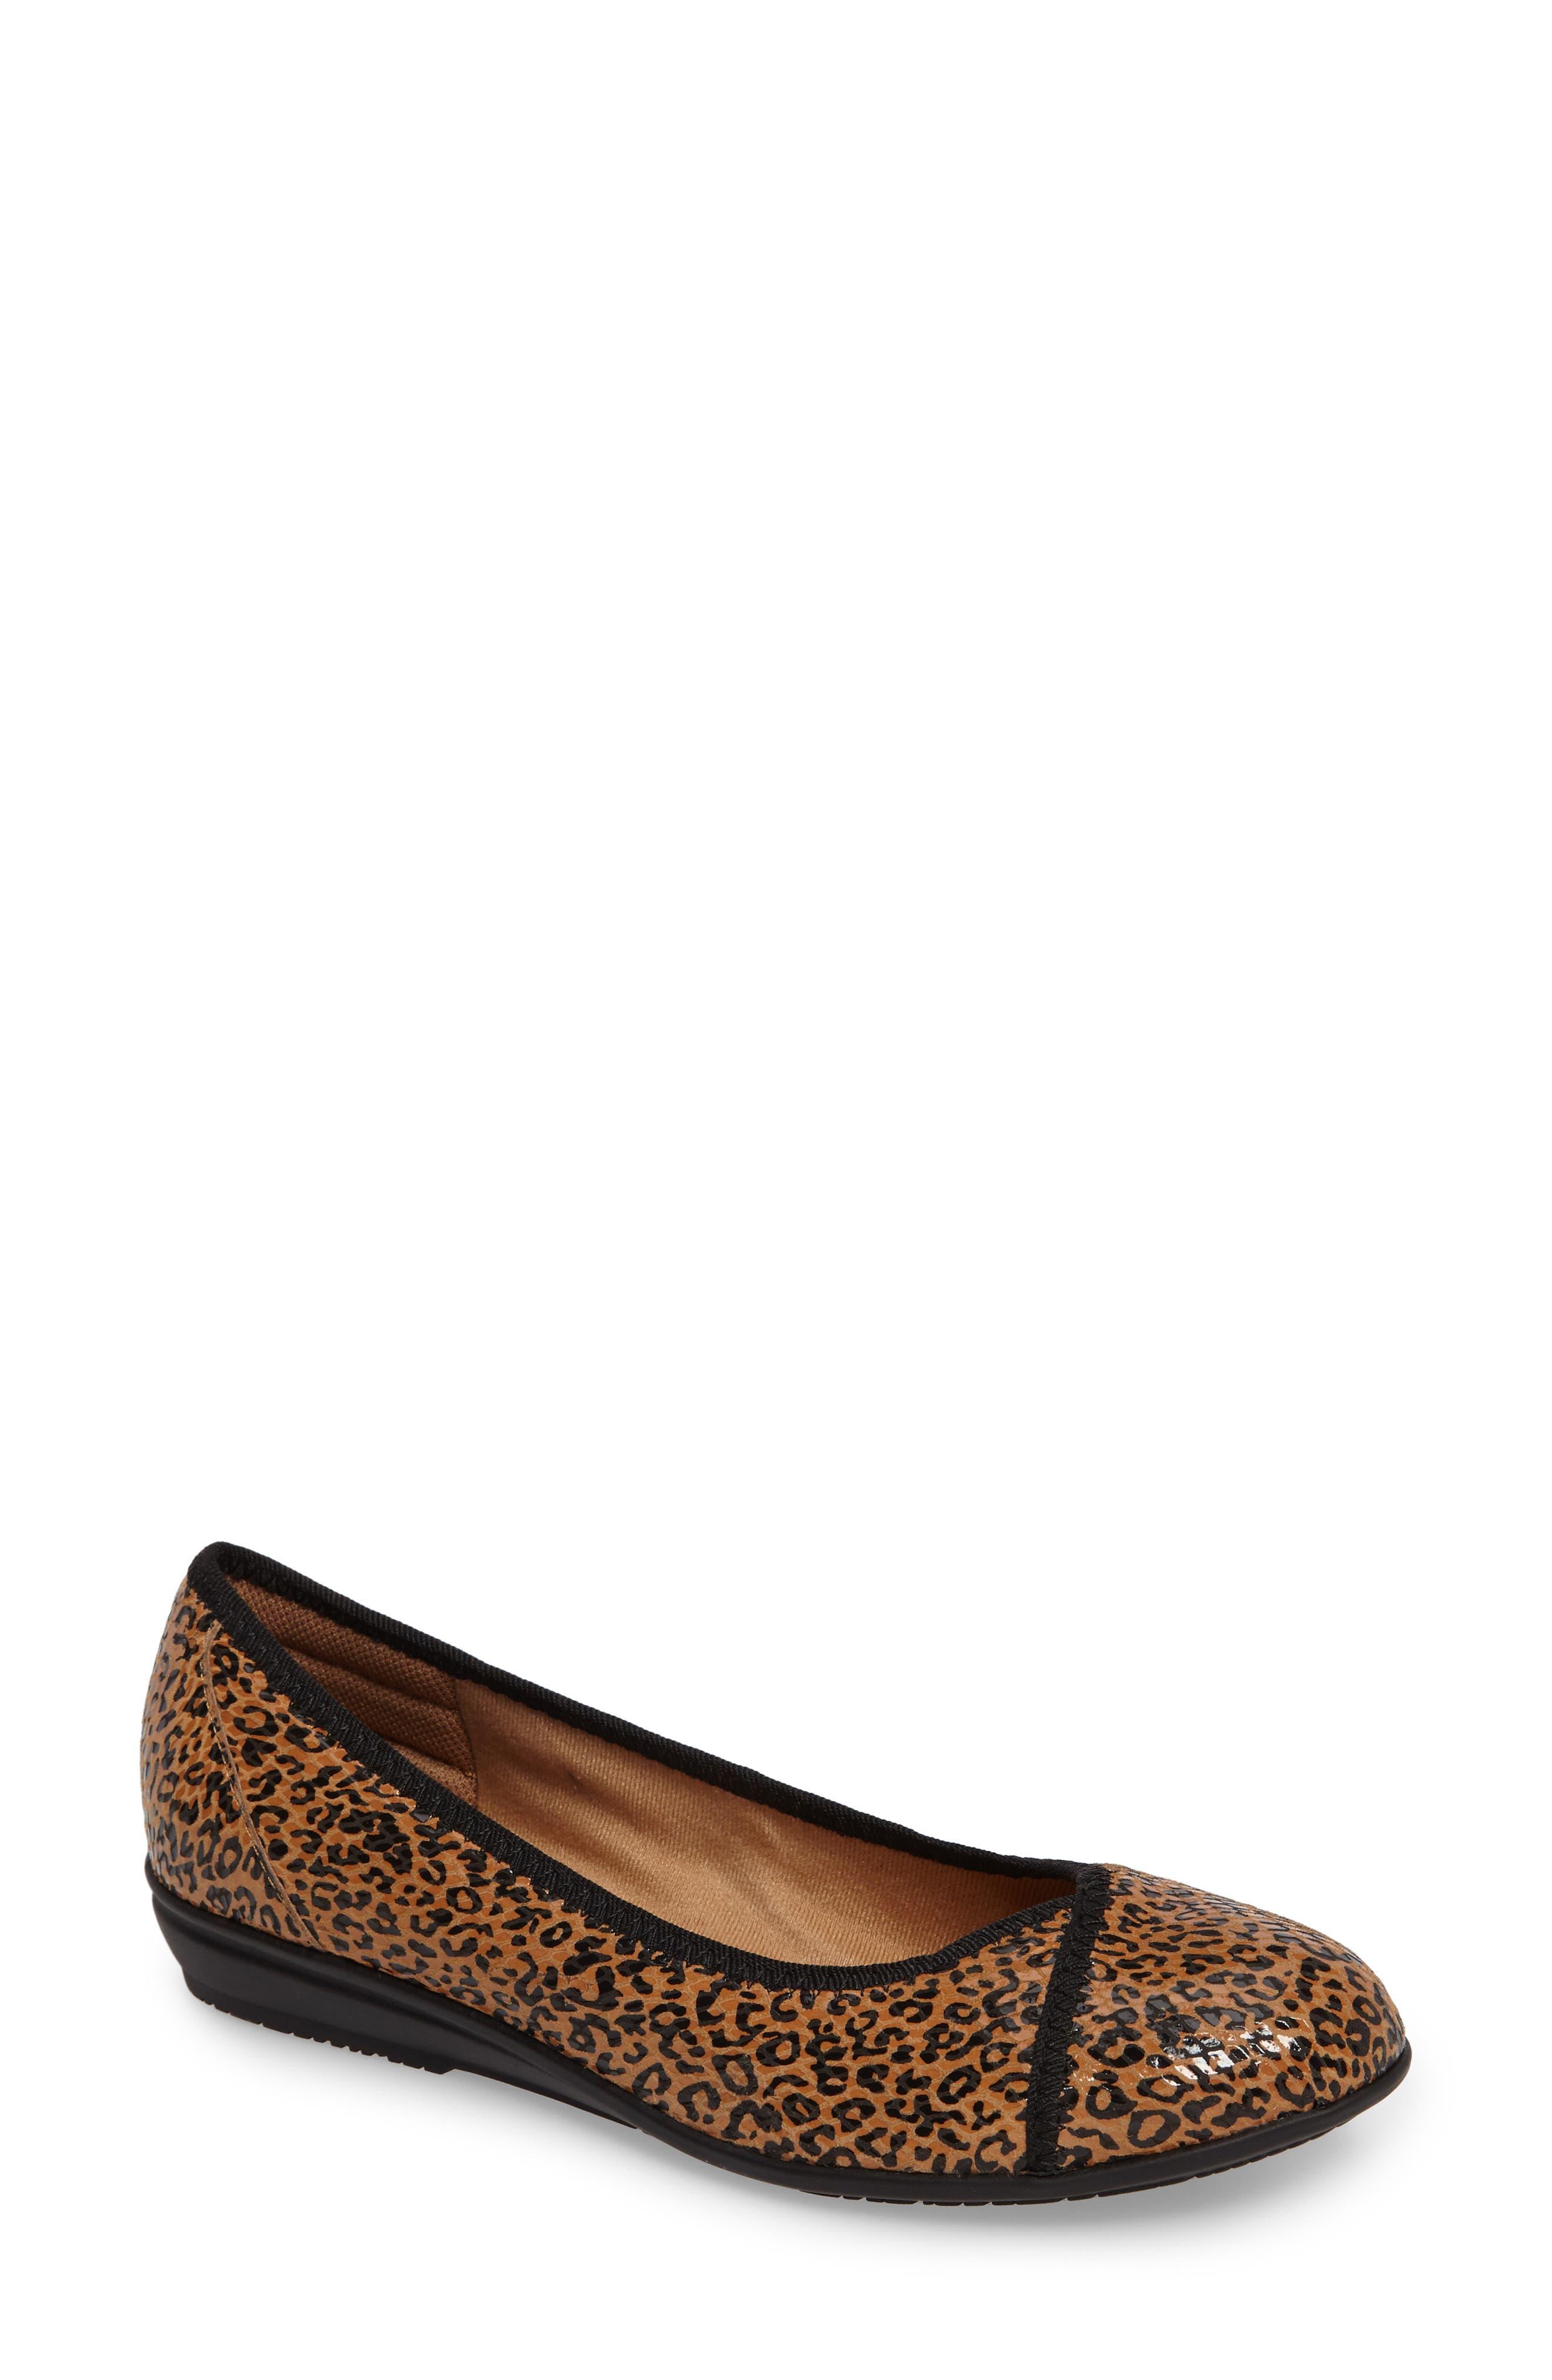 Eaton Flat,                         Main,                         color, Tan Leopard Suede